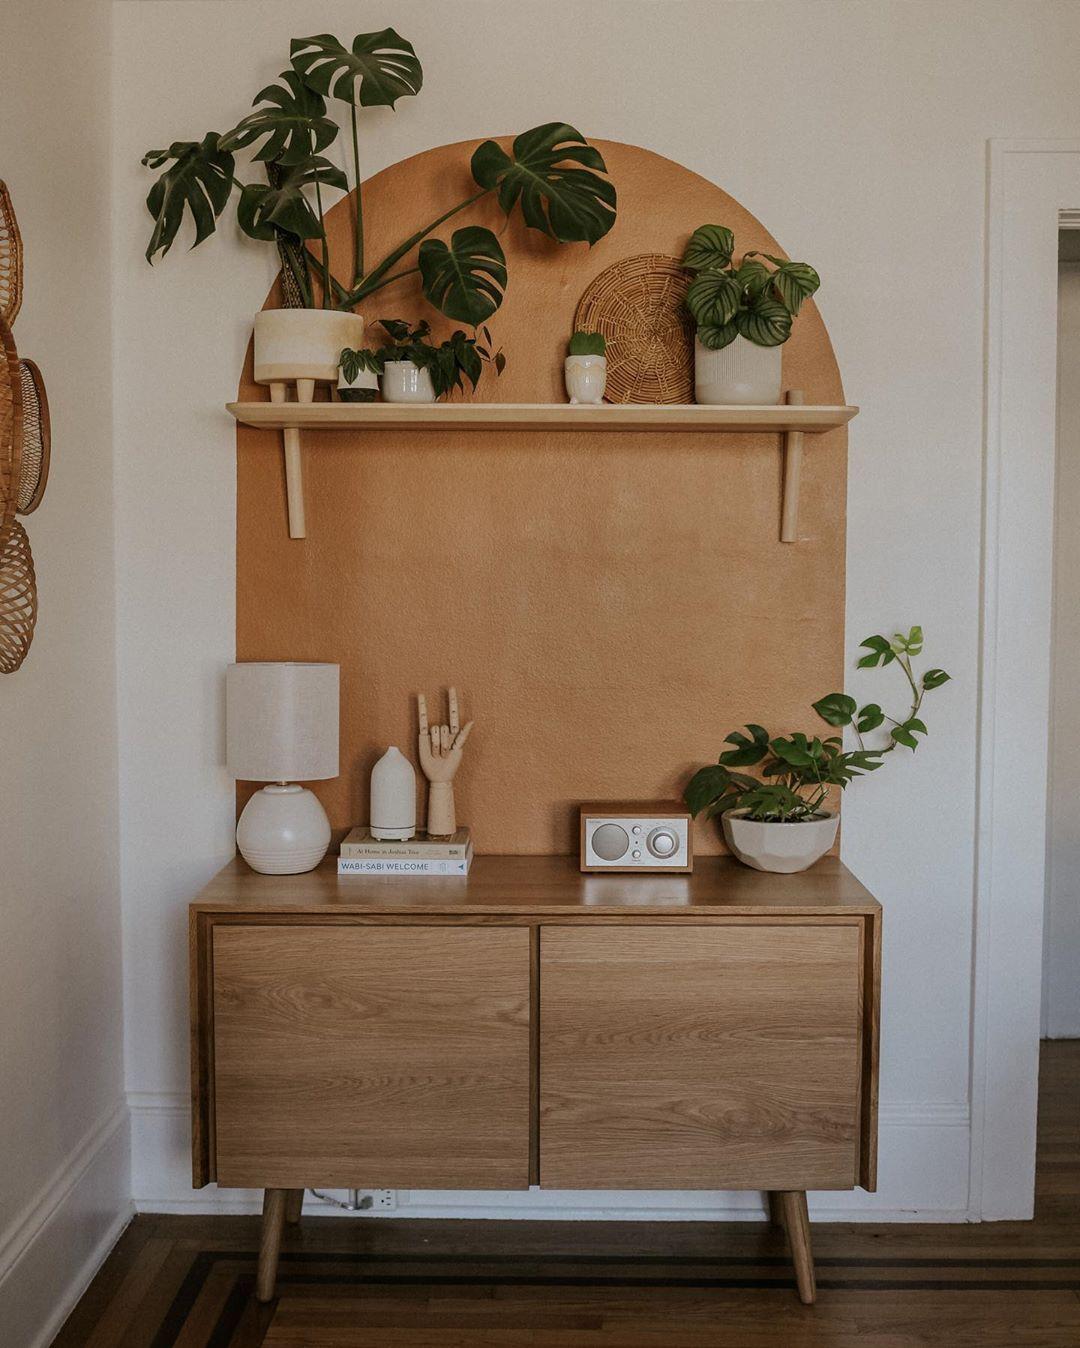 Cheap Decor Chambre - SalePrice:43$